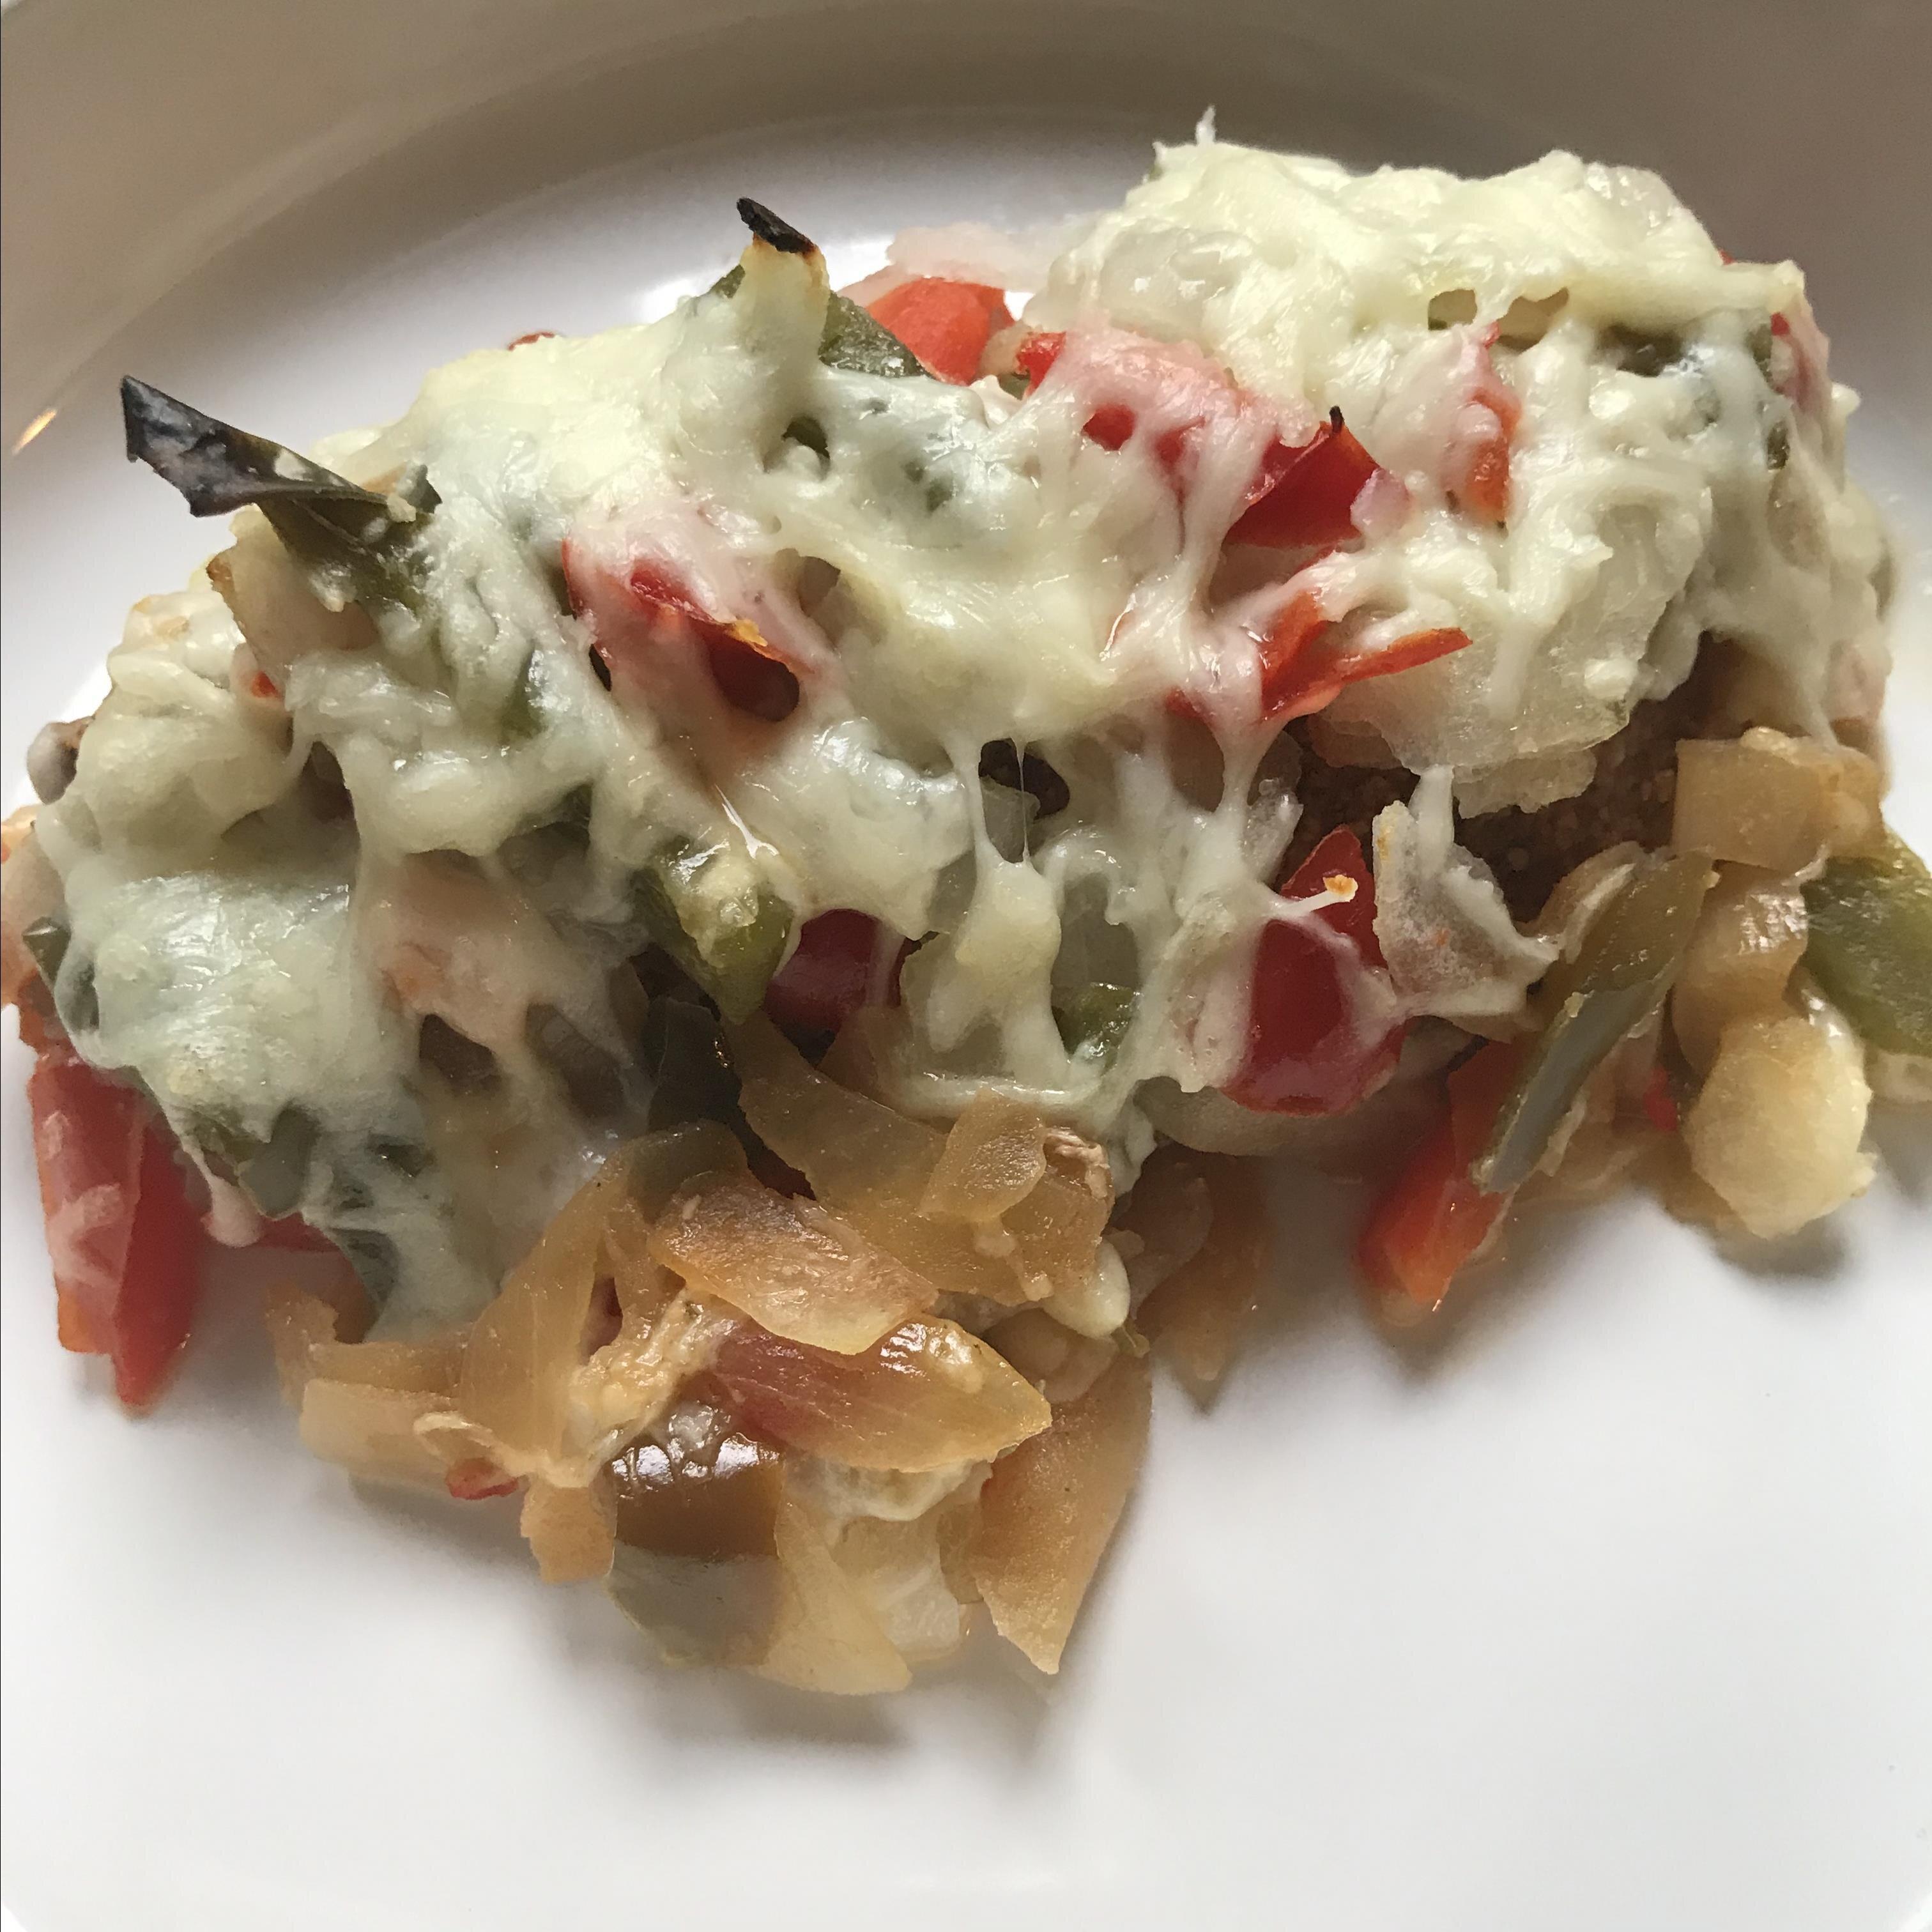 Shortcut Chicken Fajita Casserole